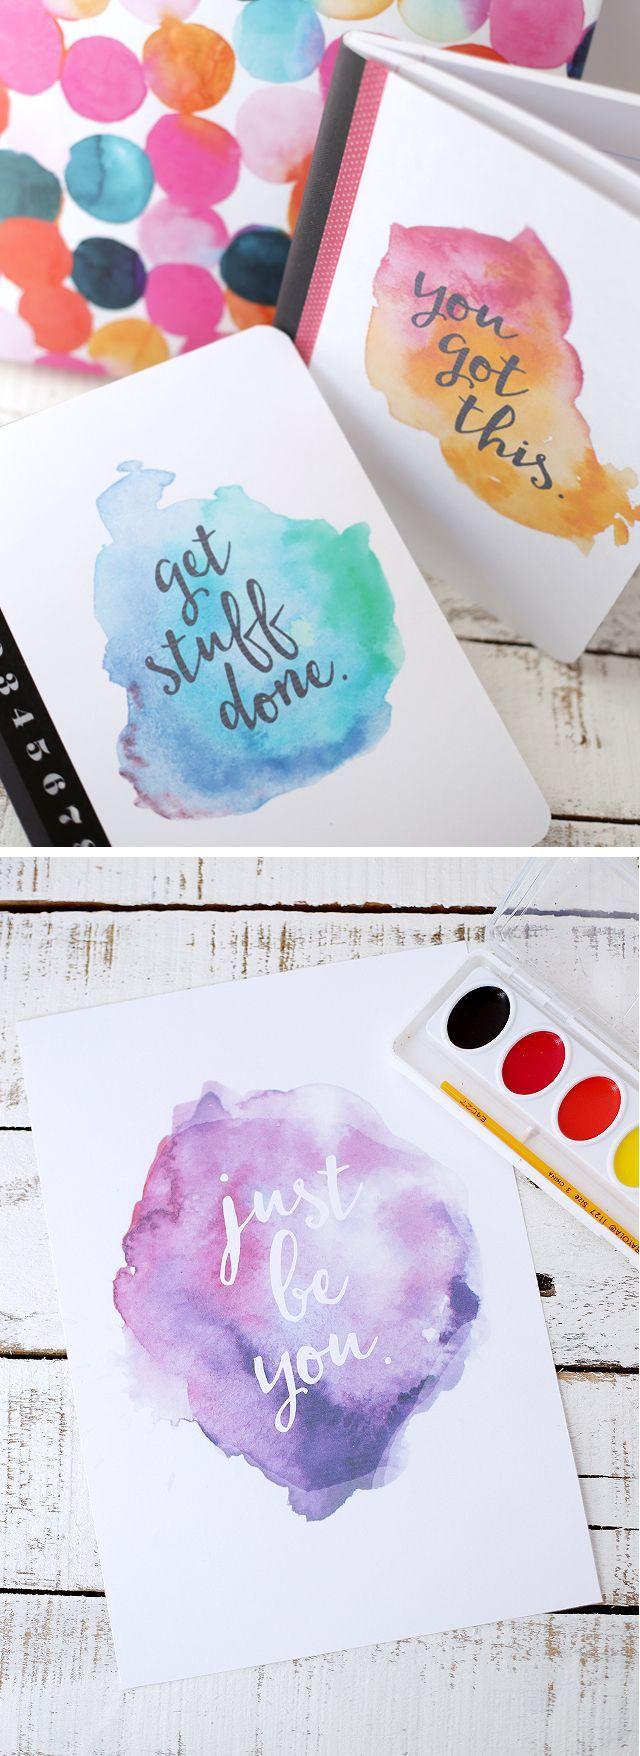 Free Printable Watercolor Notebook Covers – Eighteen25